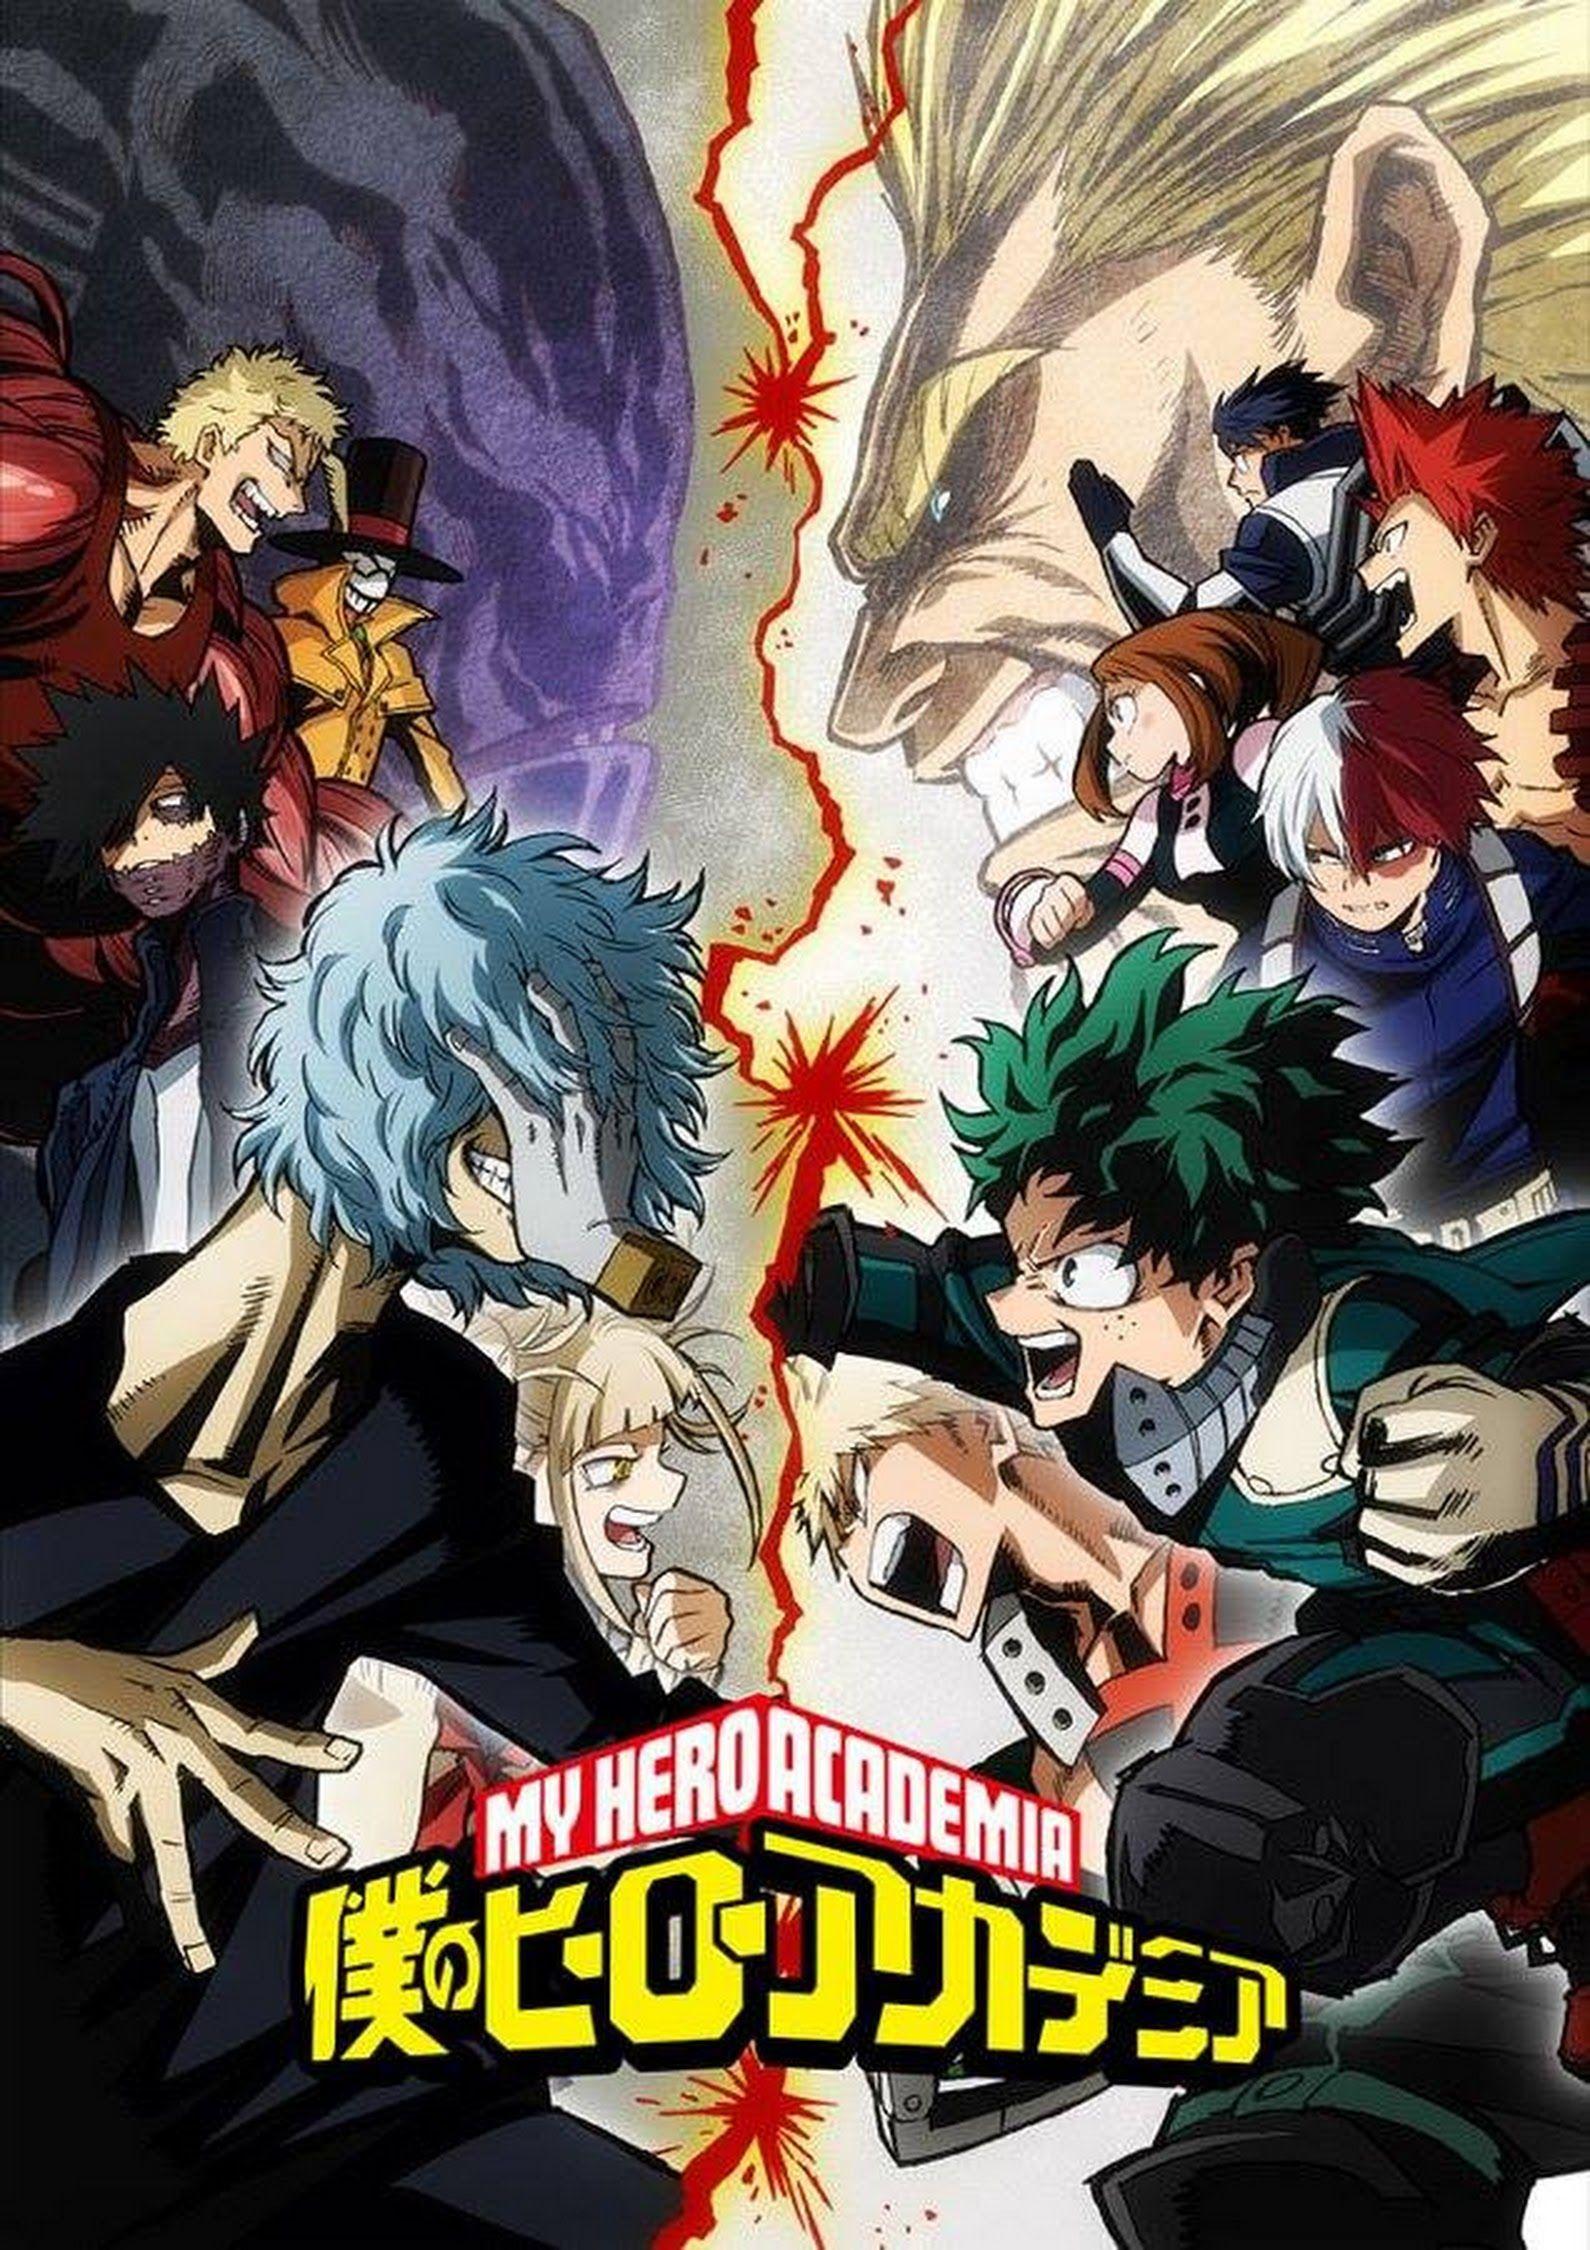 My Hero Academia Season 3 Poster Mha Bnha Hero Villain